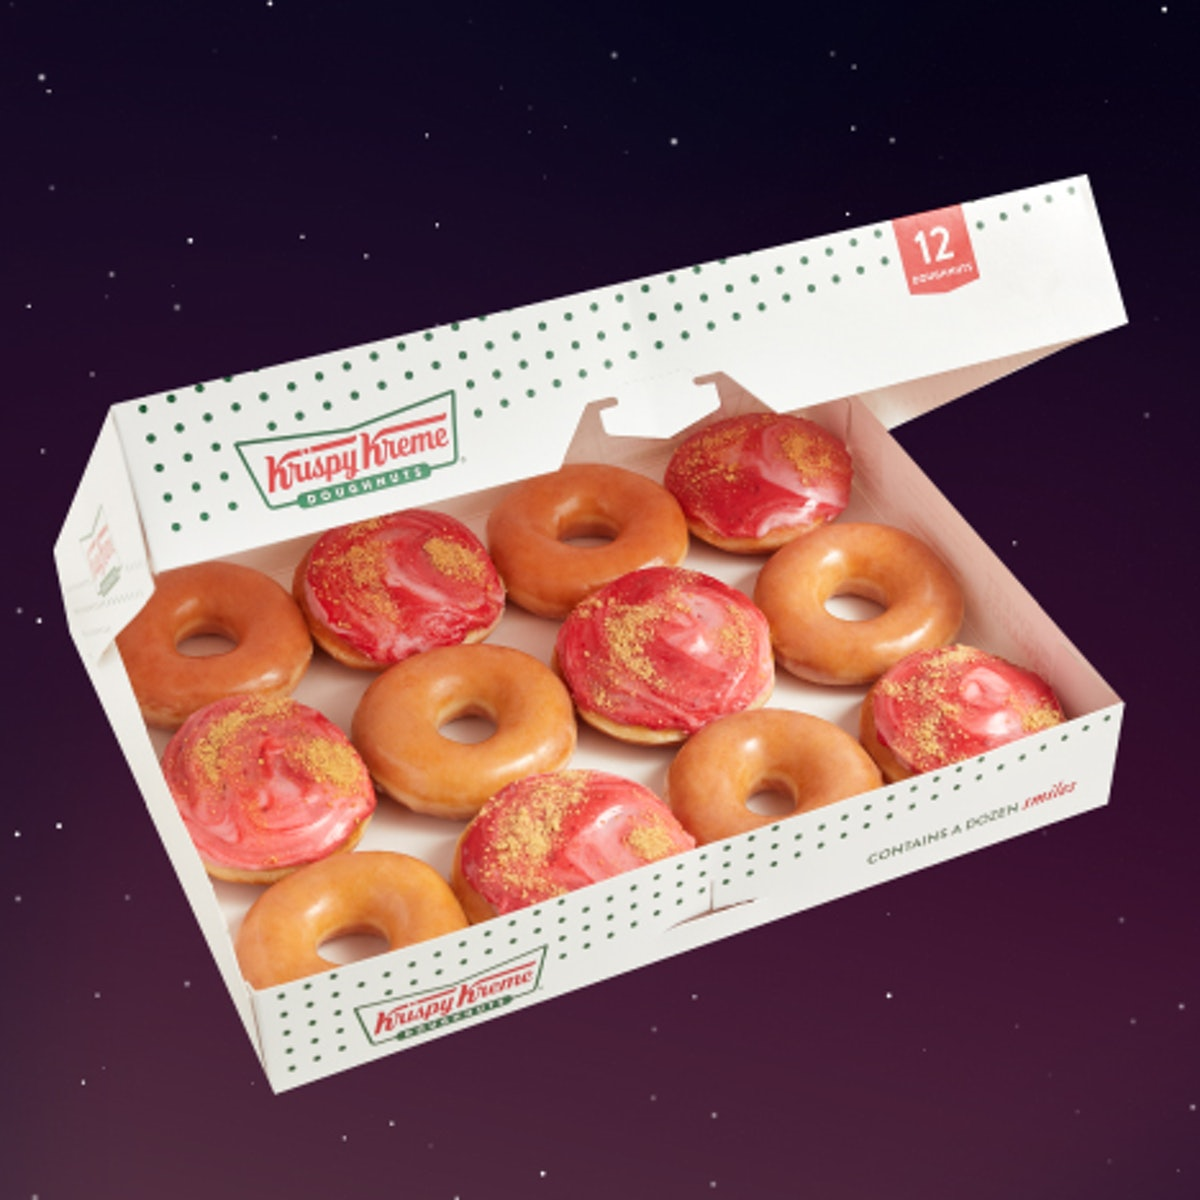 Krispy Kreme's Strawberry Supermoon doughnut is a limited-time treat.